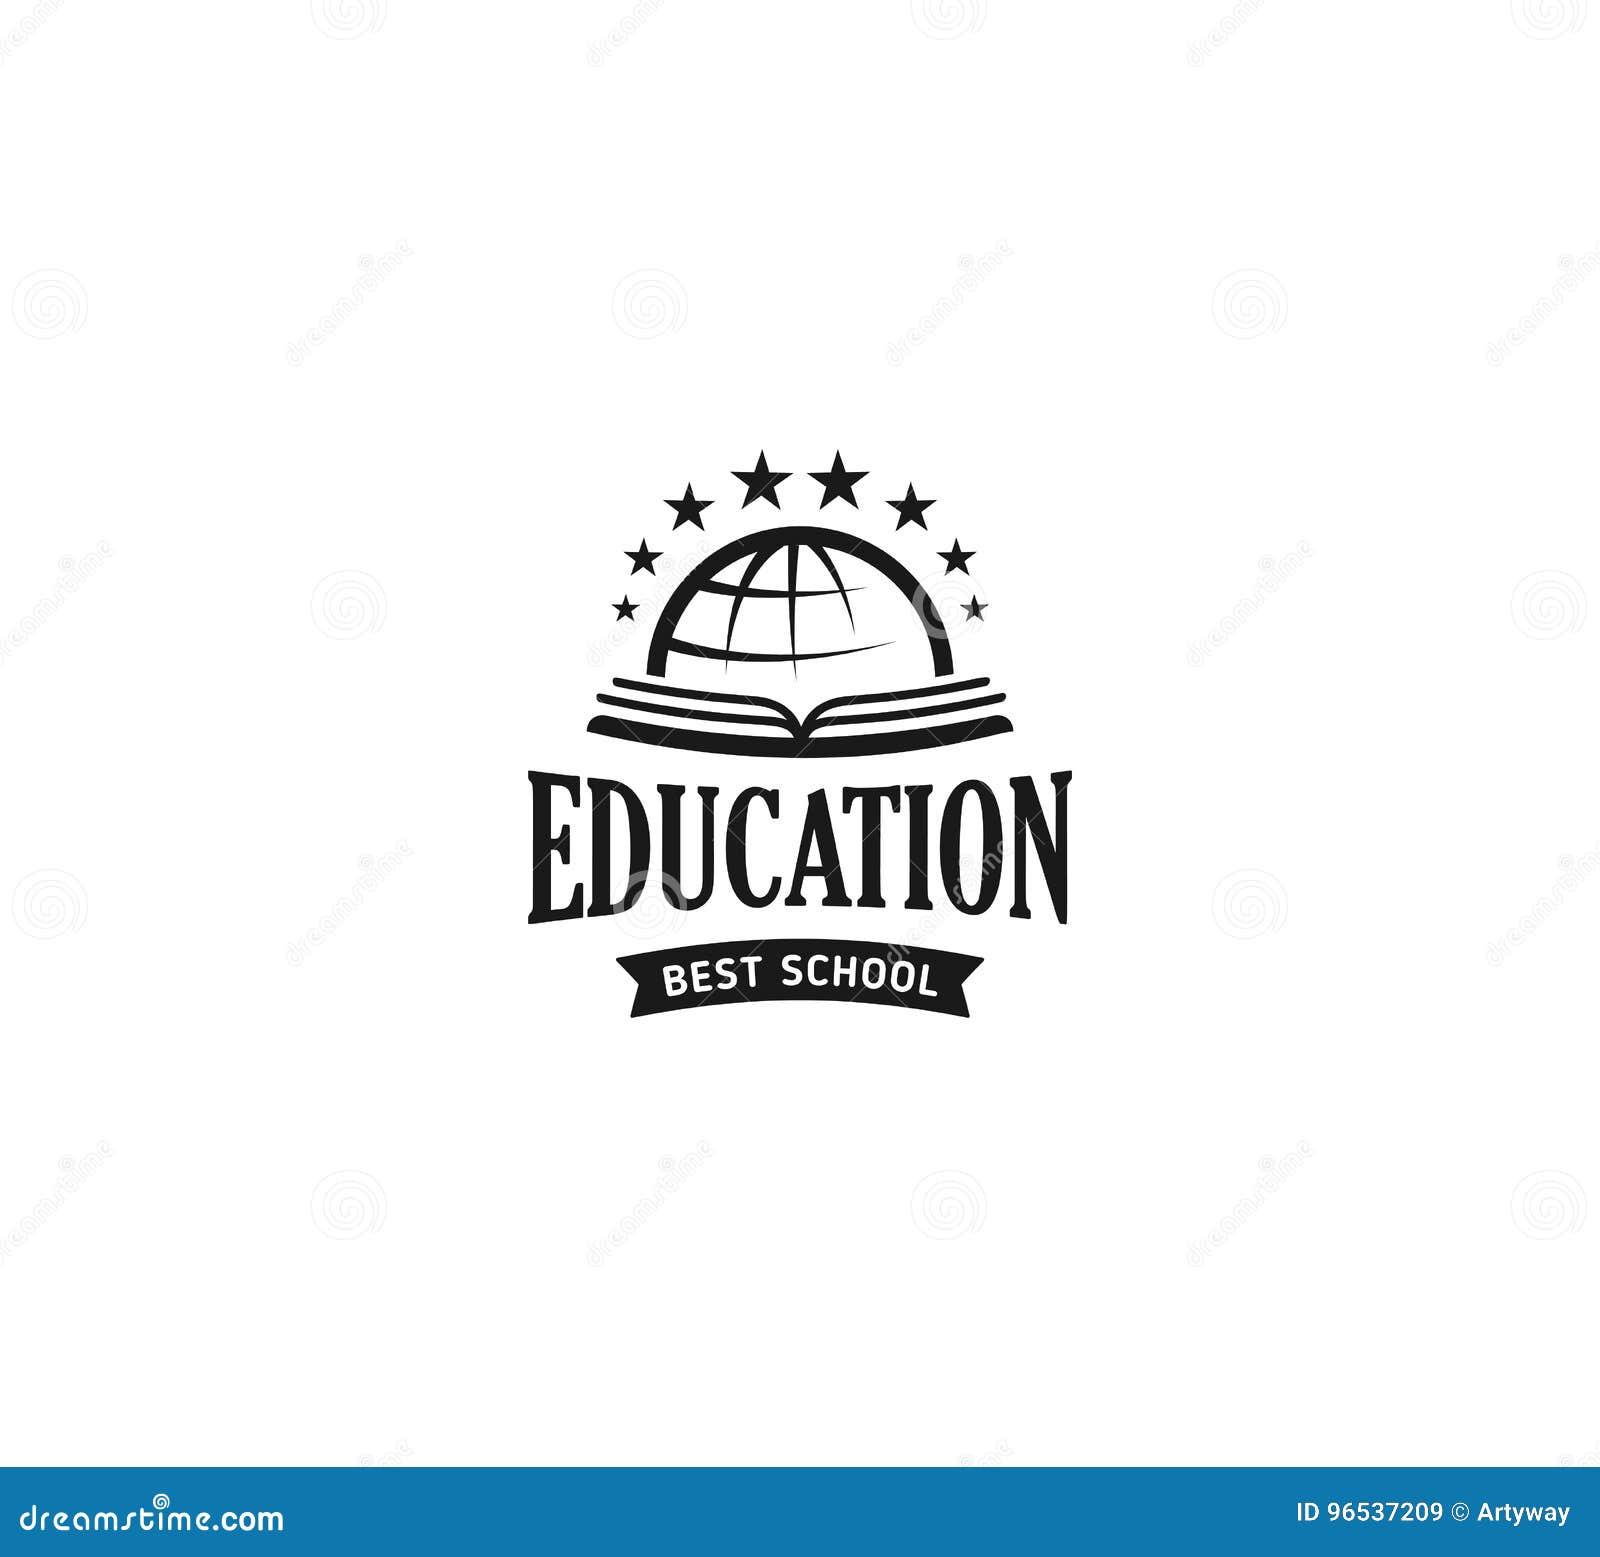 Collection Of Monochrome Flat Design Book Logo: School Logo Vector. Monochrome Vintage Style Design